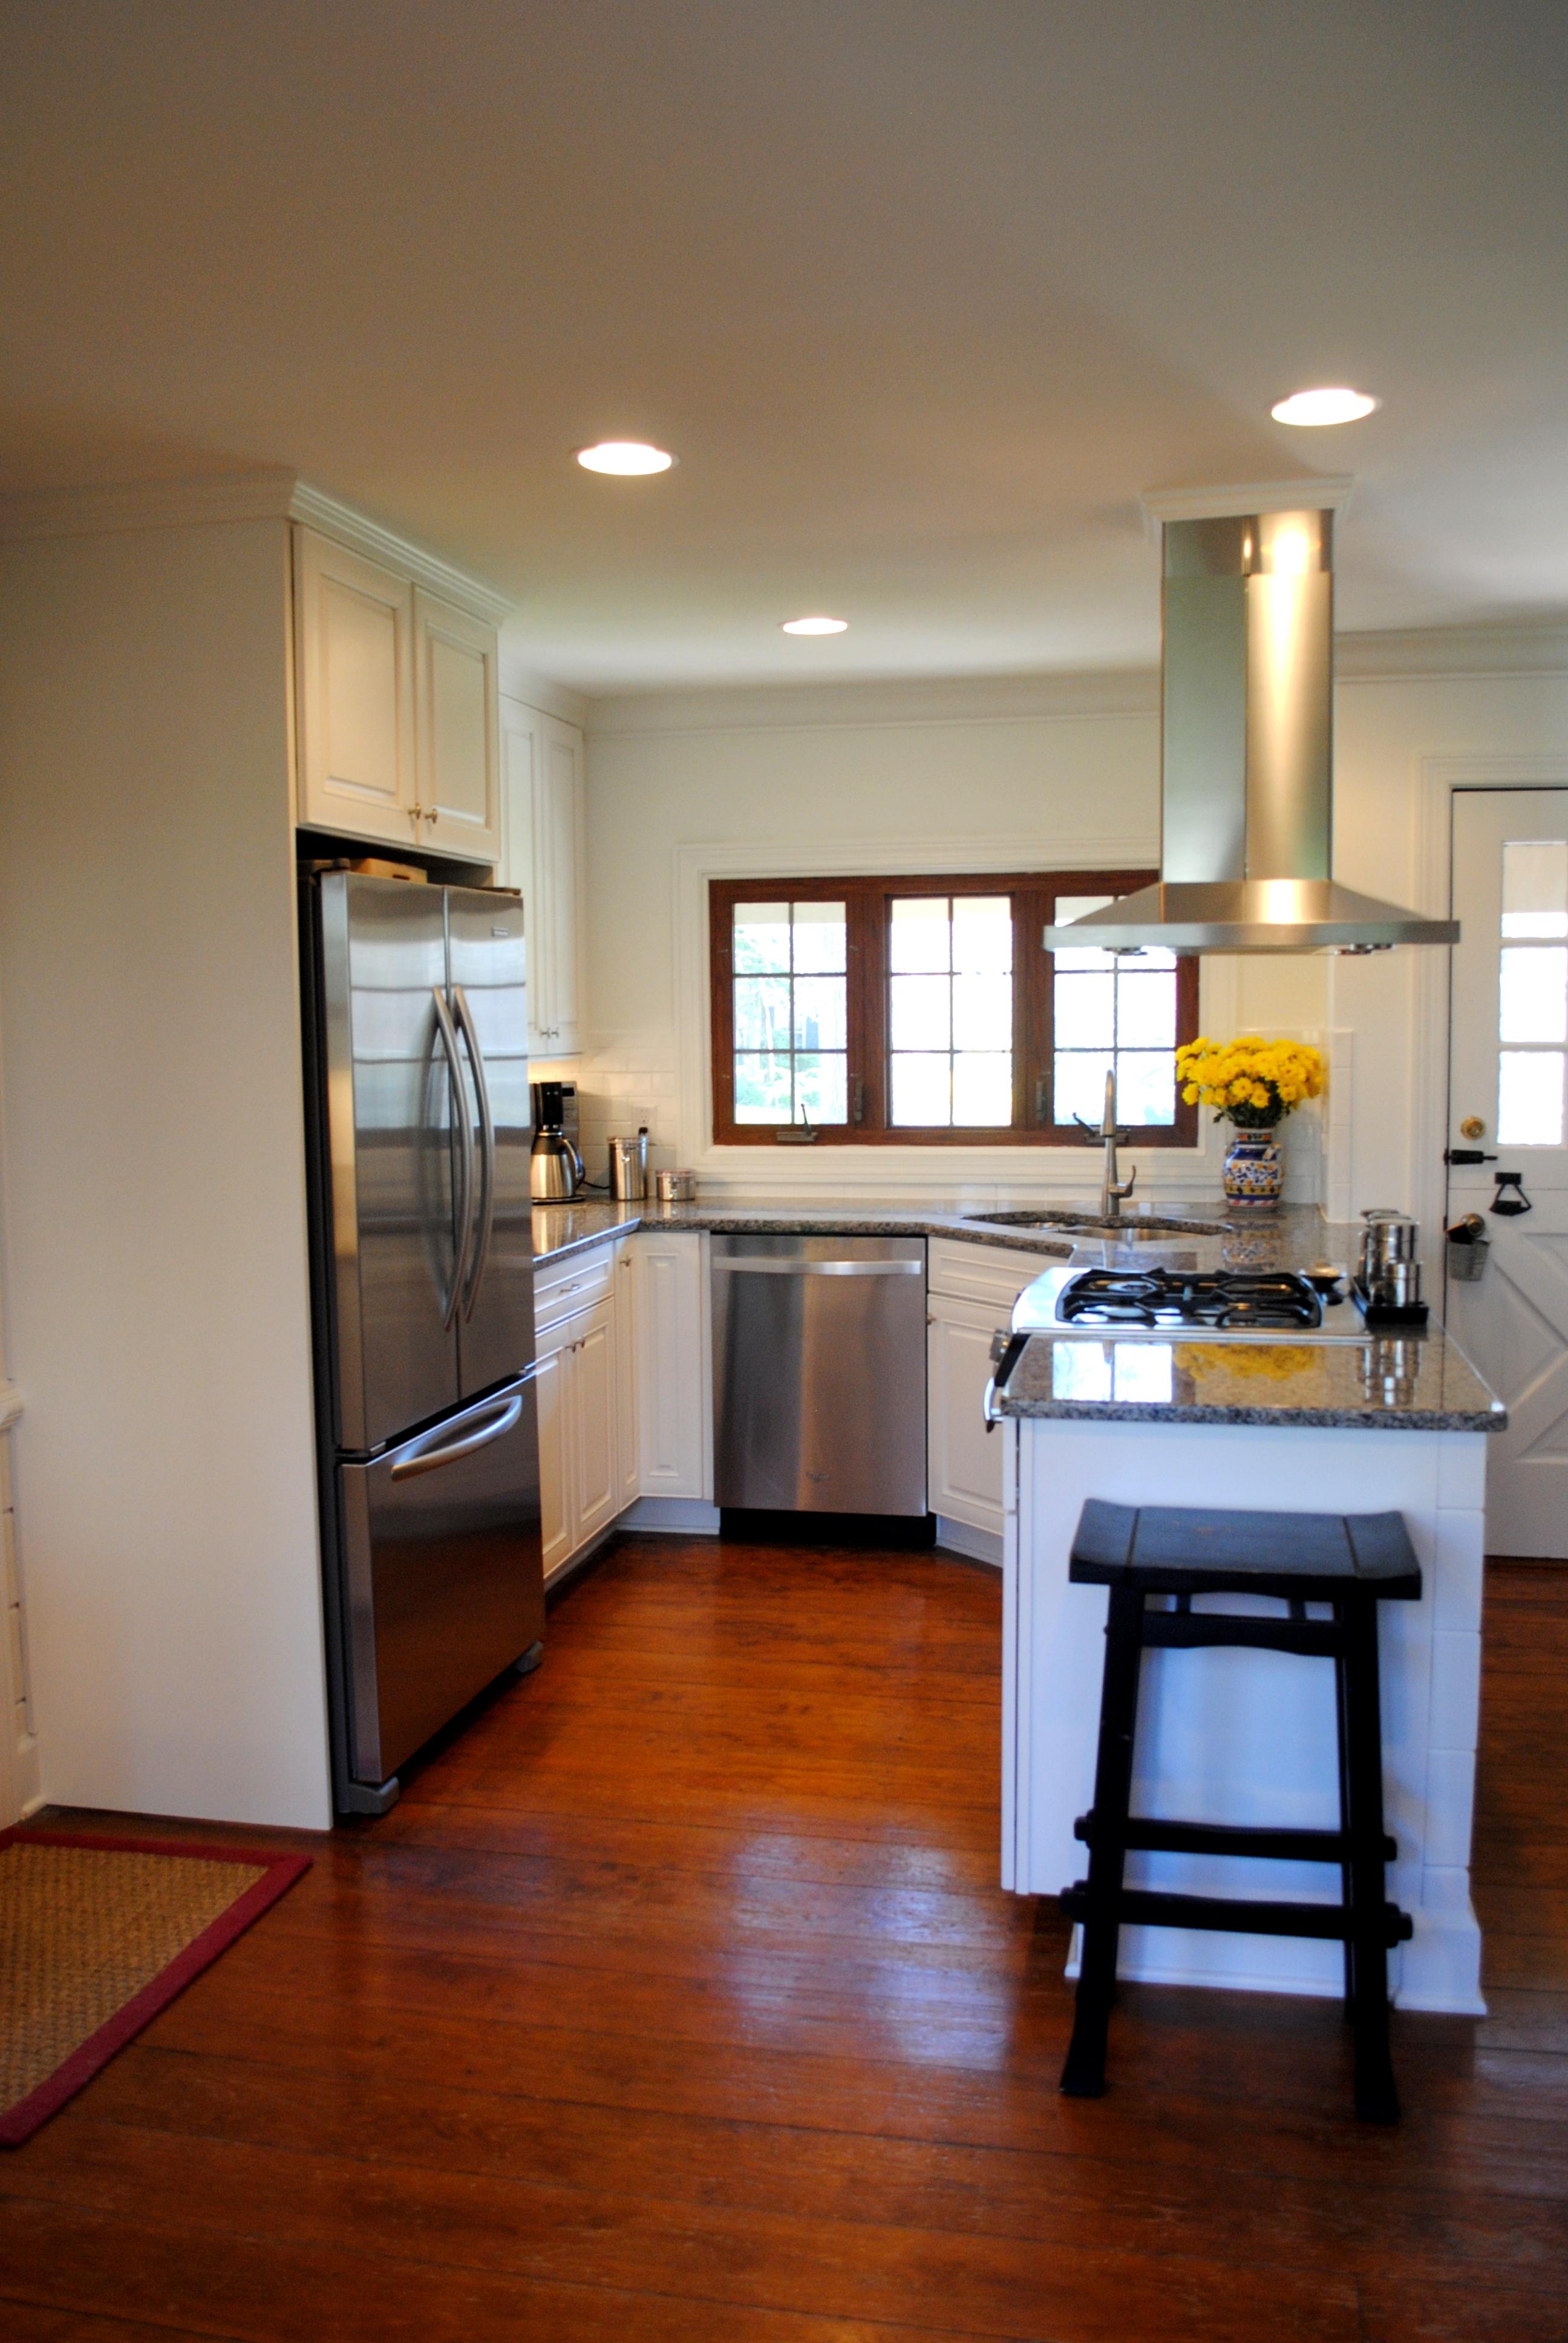 hatchett design remodel in newport news va 23606 outdoor kitchens design amp installation hampton newport